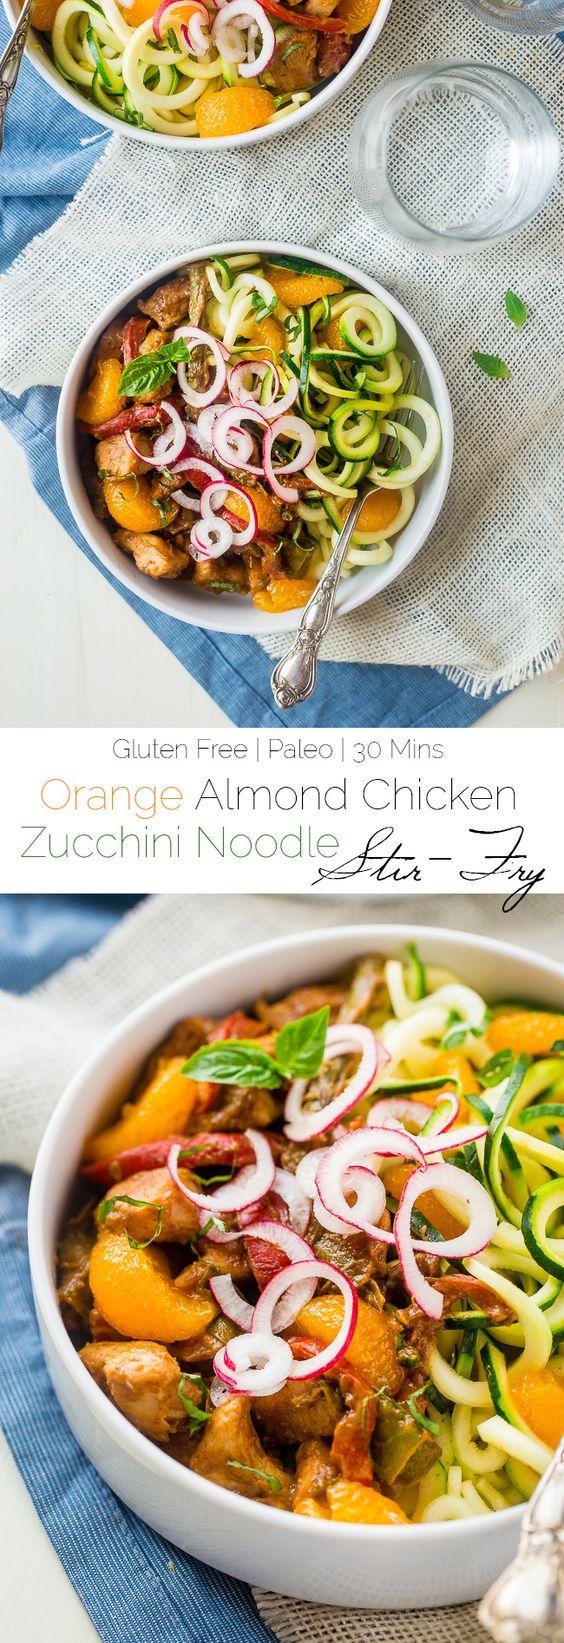 Healthy Chicken Stir Fry with Dijon Orange Almond Sauce and